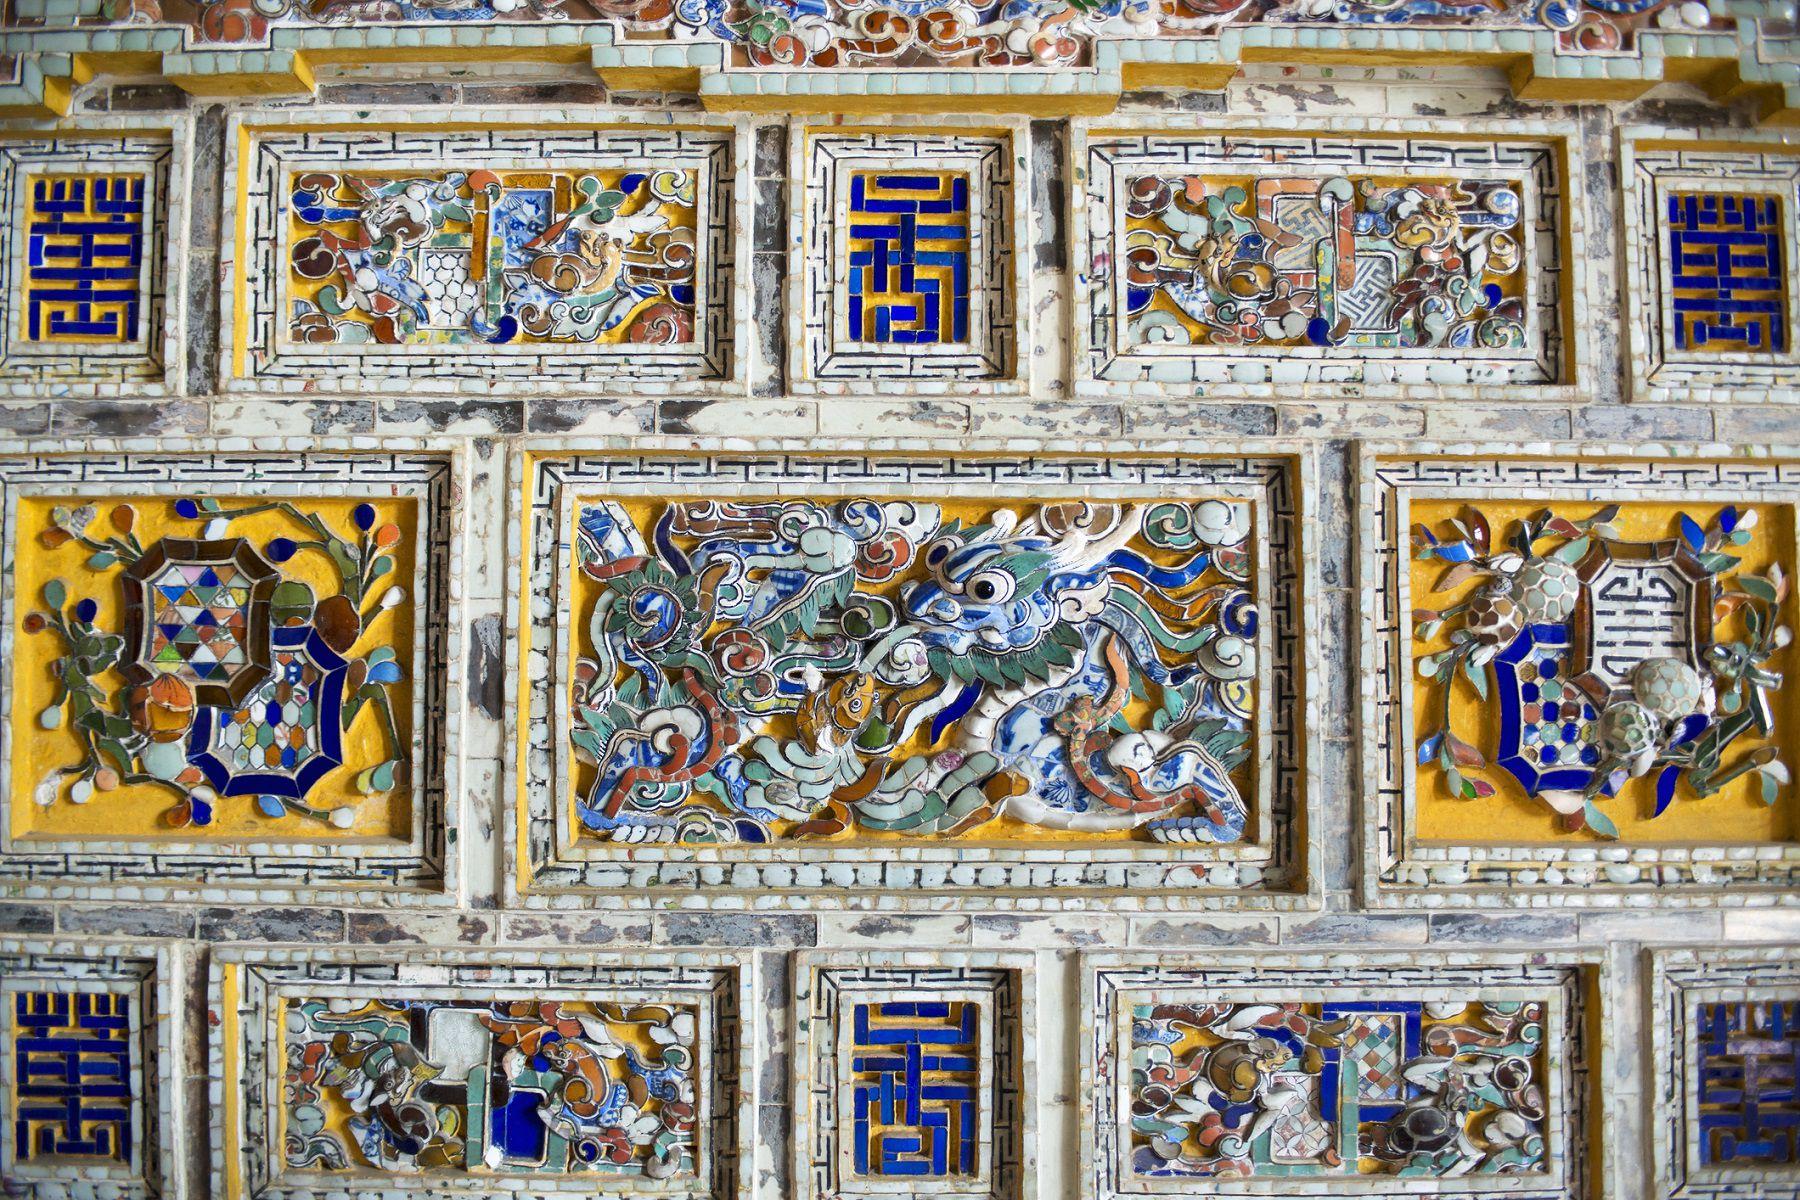 Detail, inlaid ceramic mosaic, Thien Dinh Palace, Khai Dinh Royal Tomb, Hue, Vietnam.